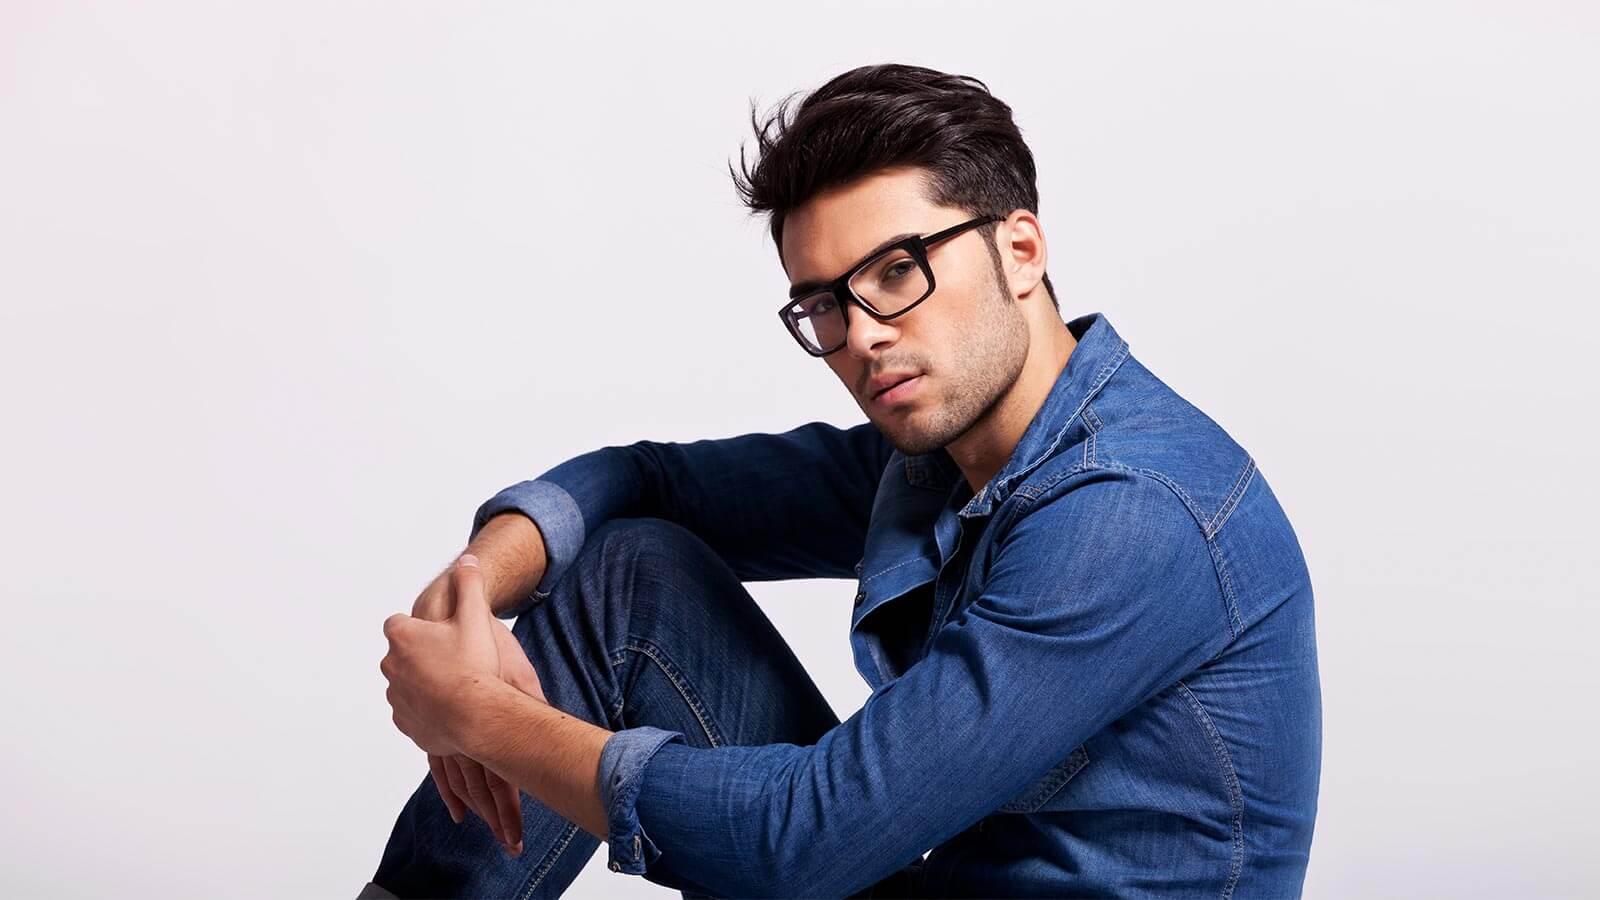 Men's Eyewear Trends 2019 For Summer